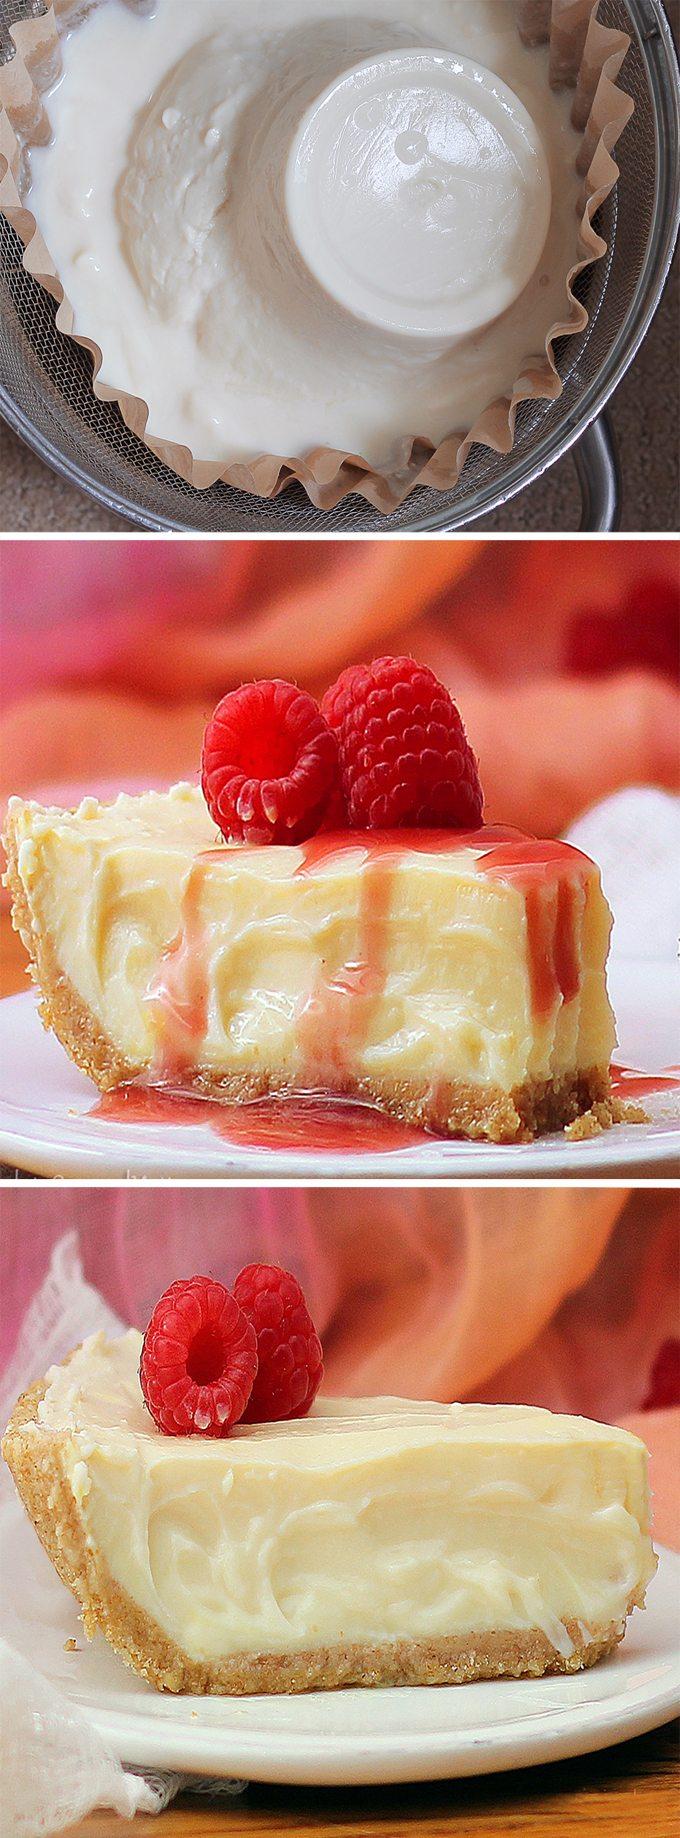 Greek Yogurt Cheesecake – Ingredients: 2 cups yogurt, 1/4 cup maple syrup, 1 tbsp lemon juice, pinch salt, 2/3 cup… Full recipe: http://choclatecoveredkatie.com @choccoveredkt